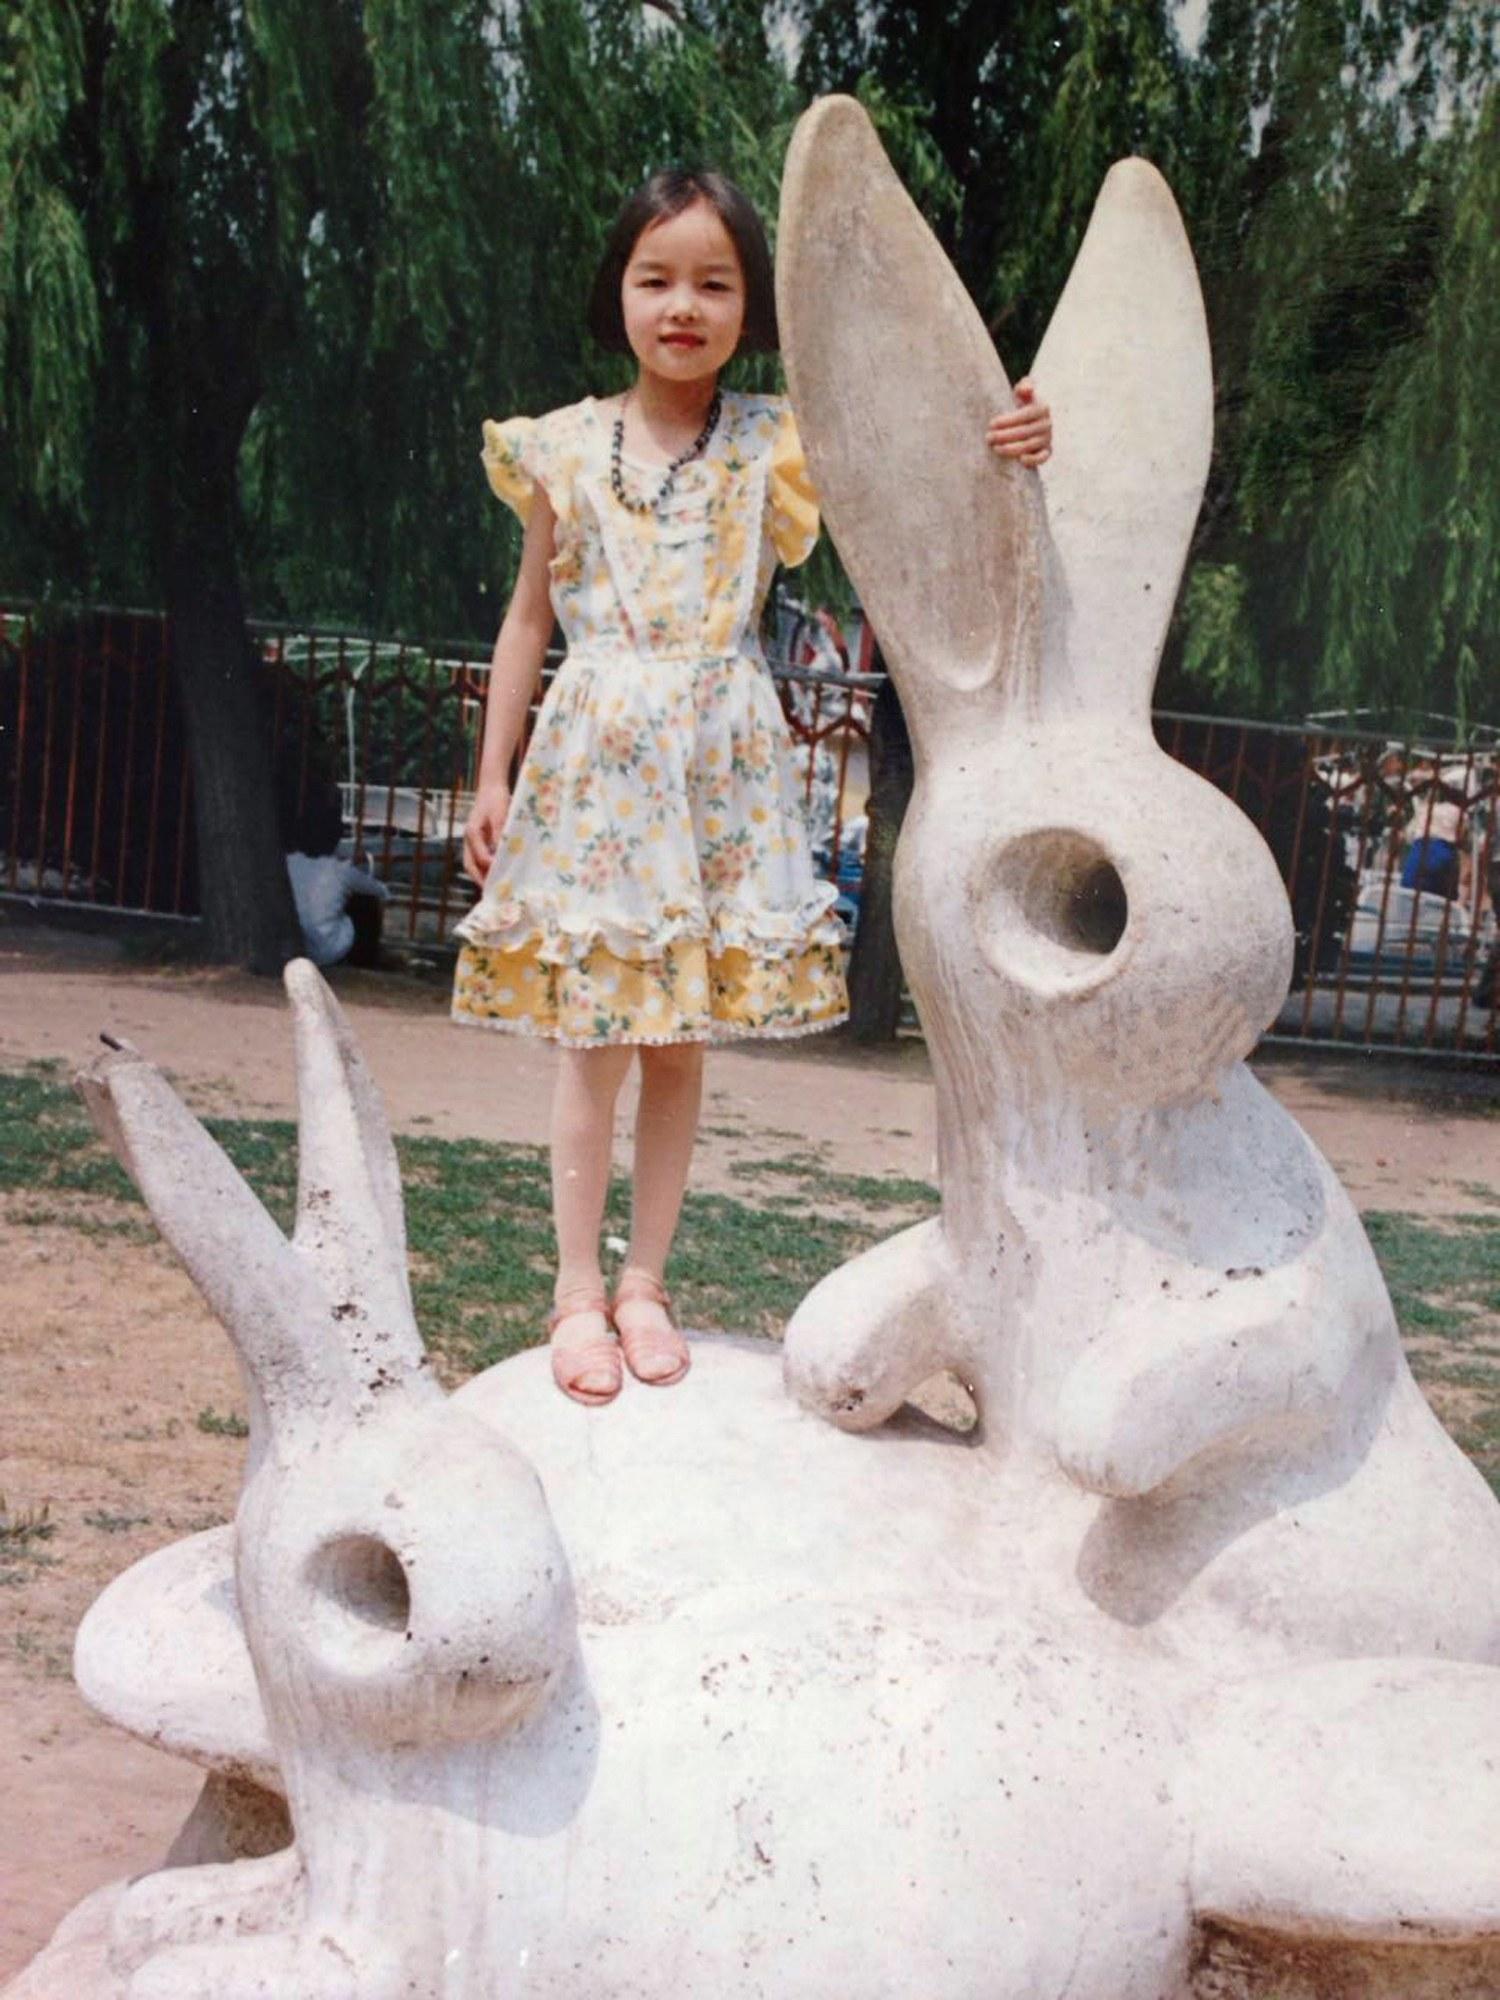 Fei Fei Sun childhood photo one at Vogue.com